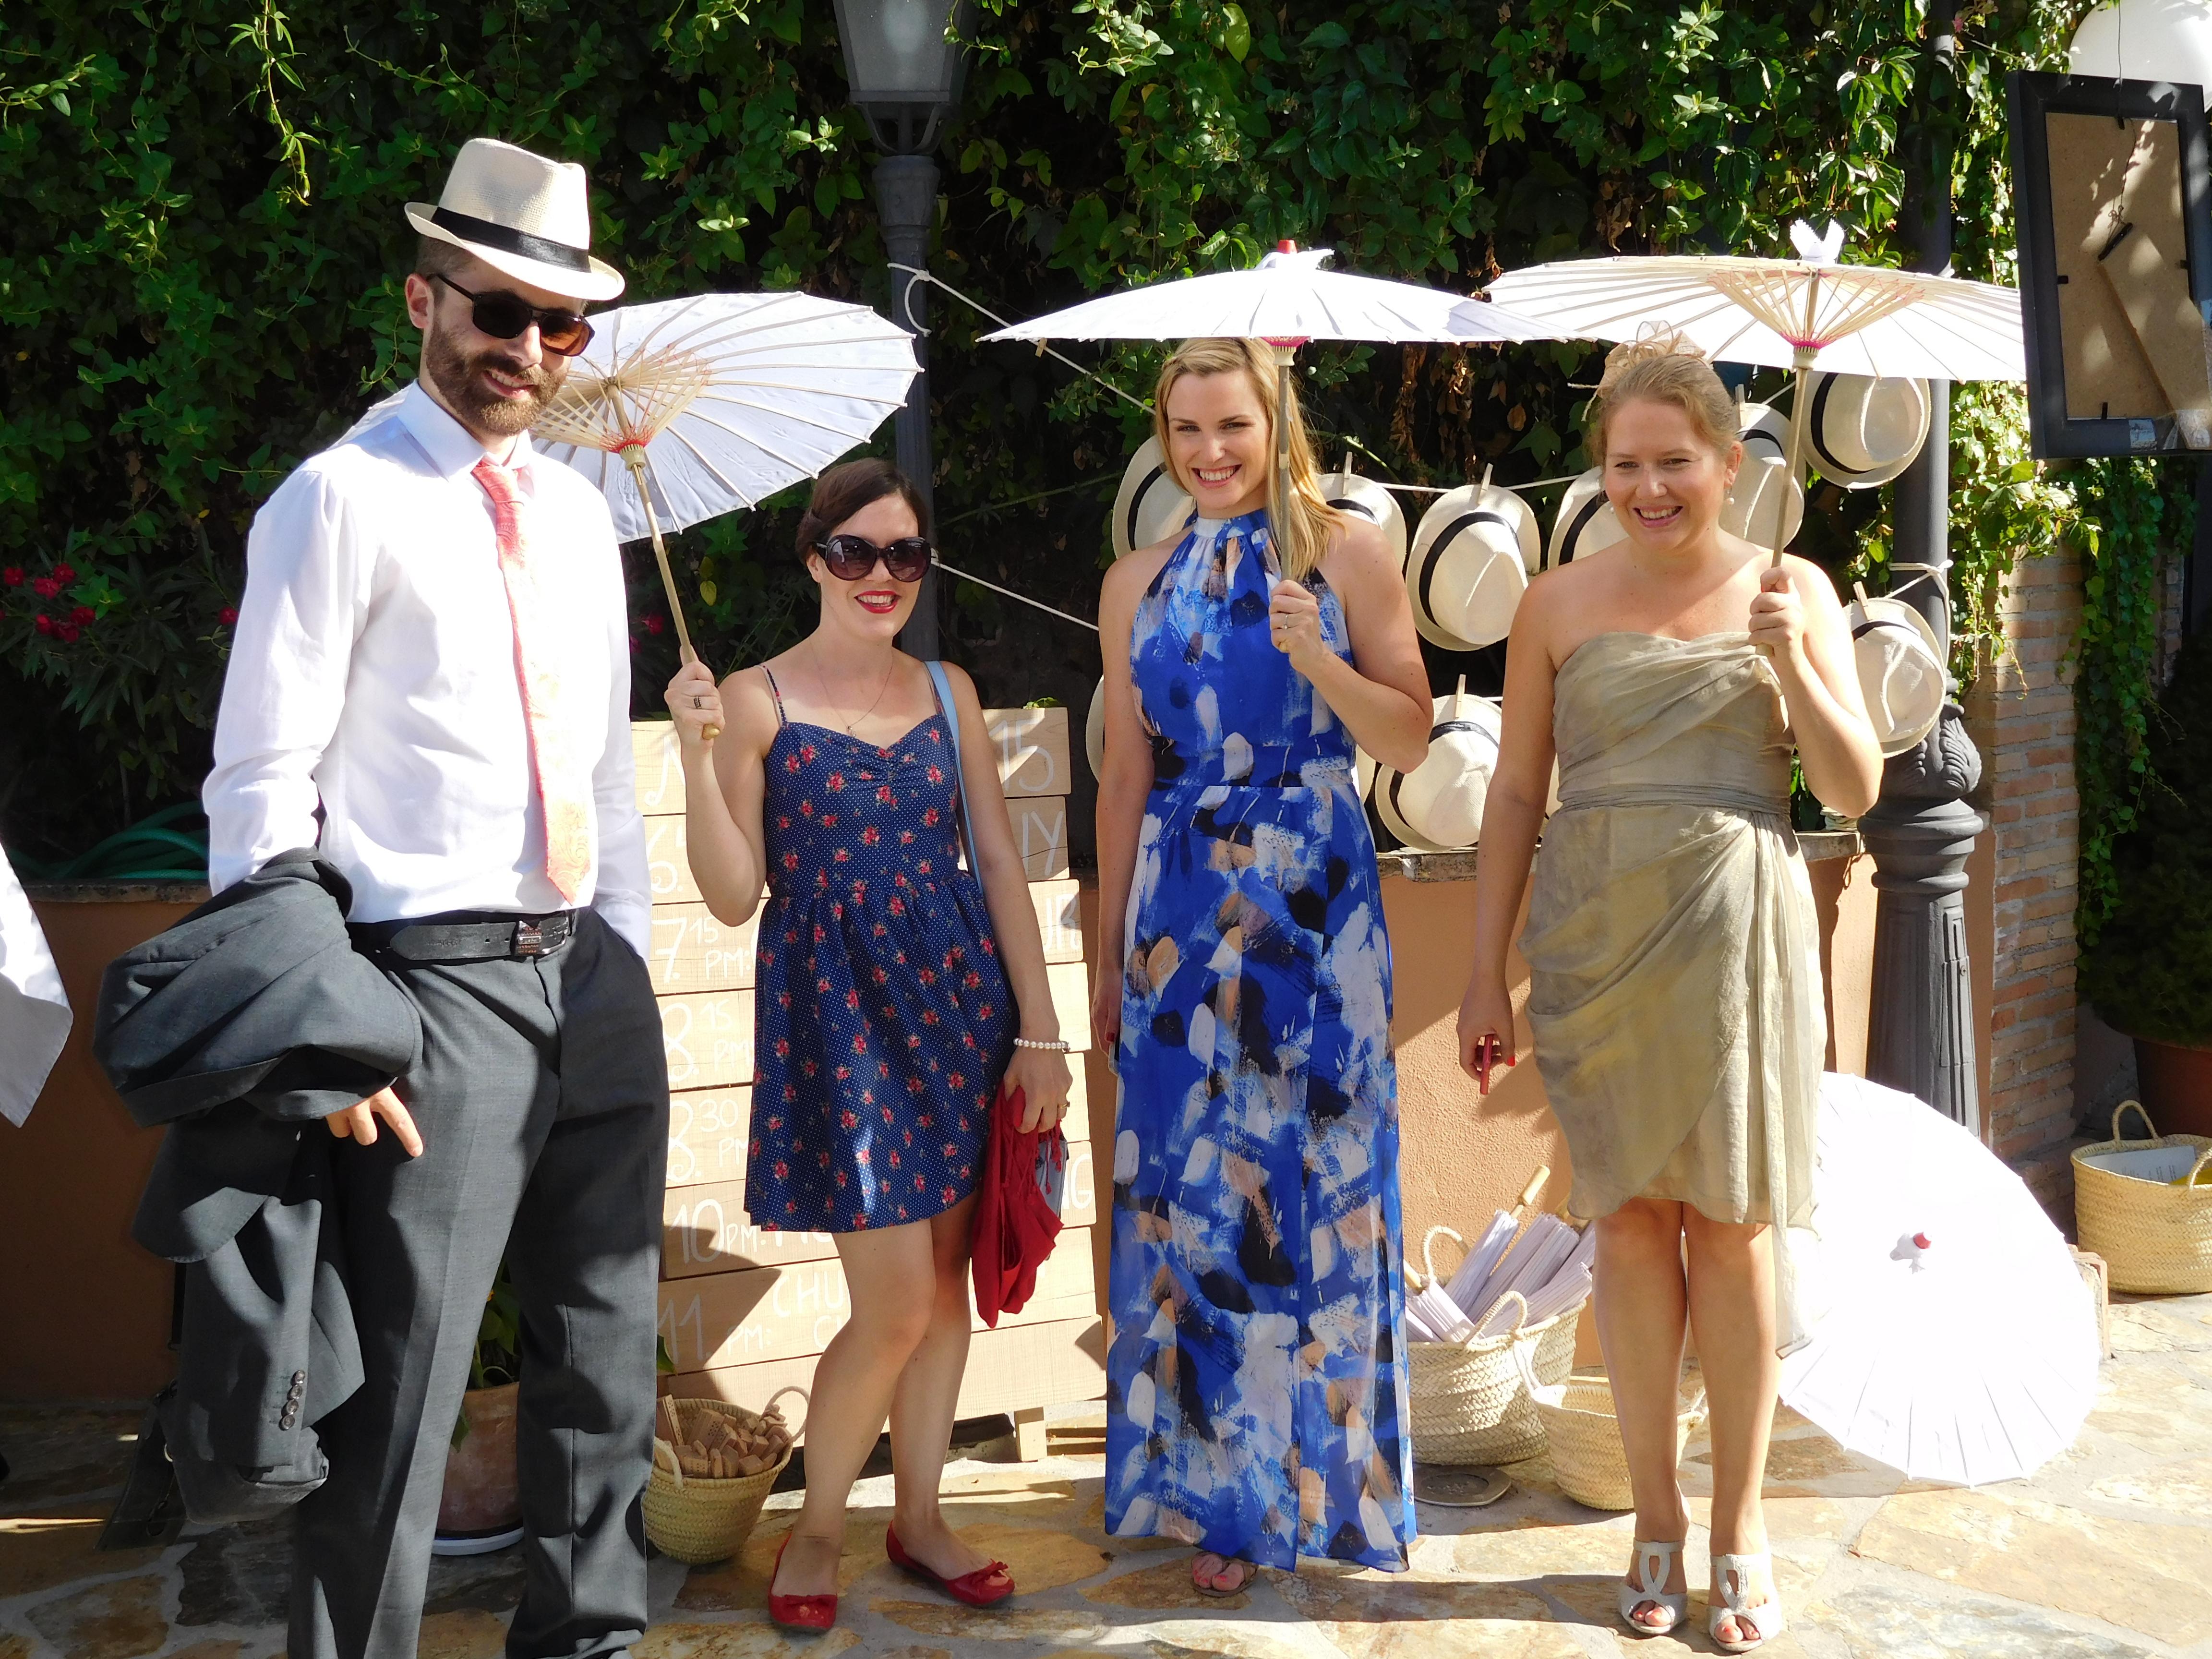 Michelle & Tom's Wedding At The Carmen De Los Chapiteles